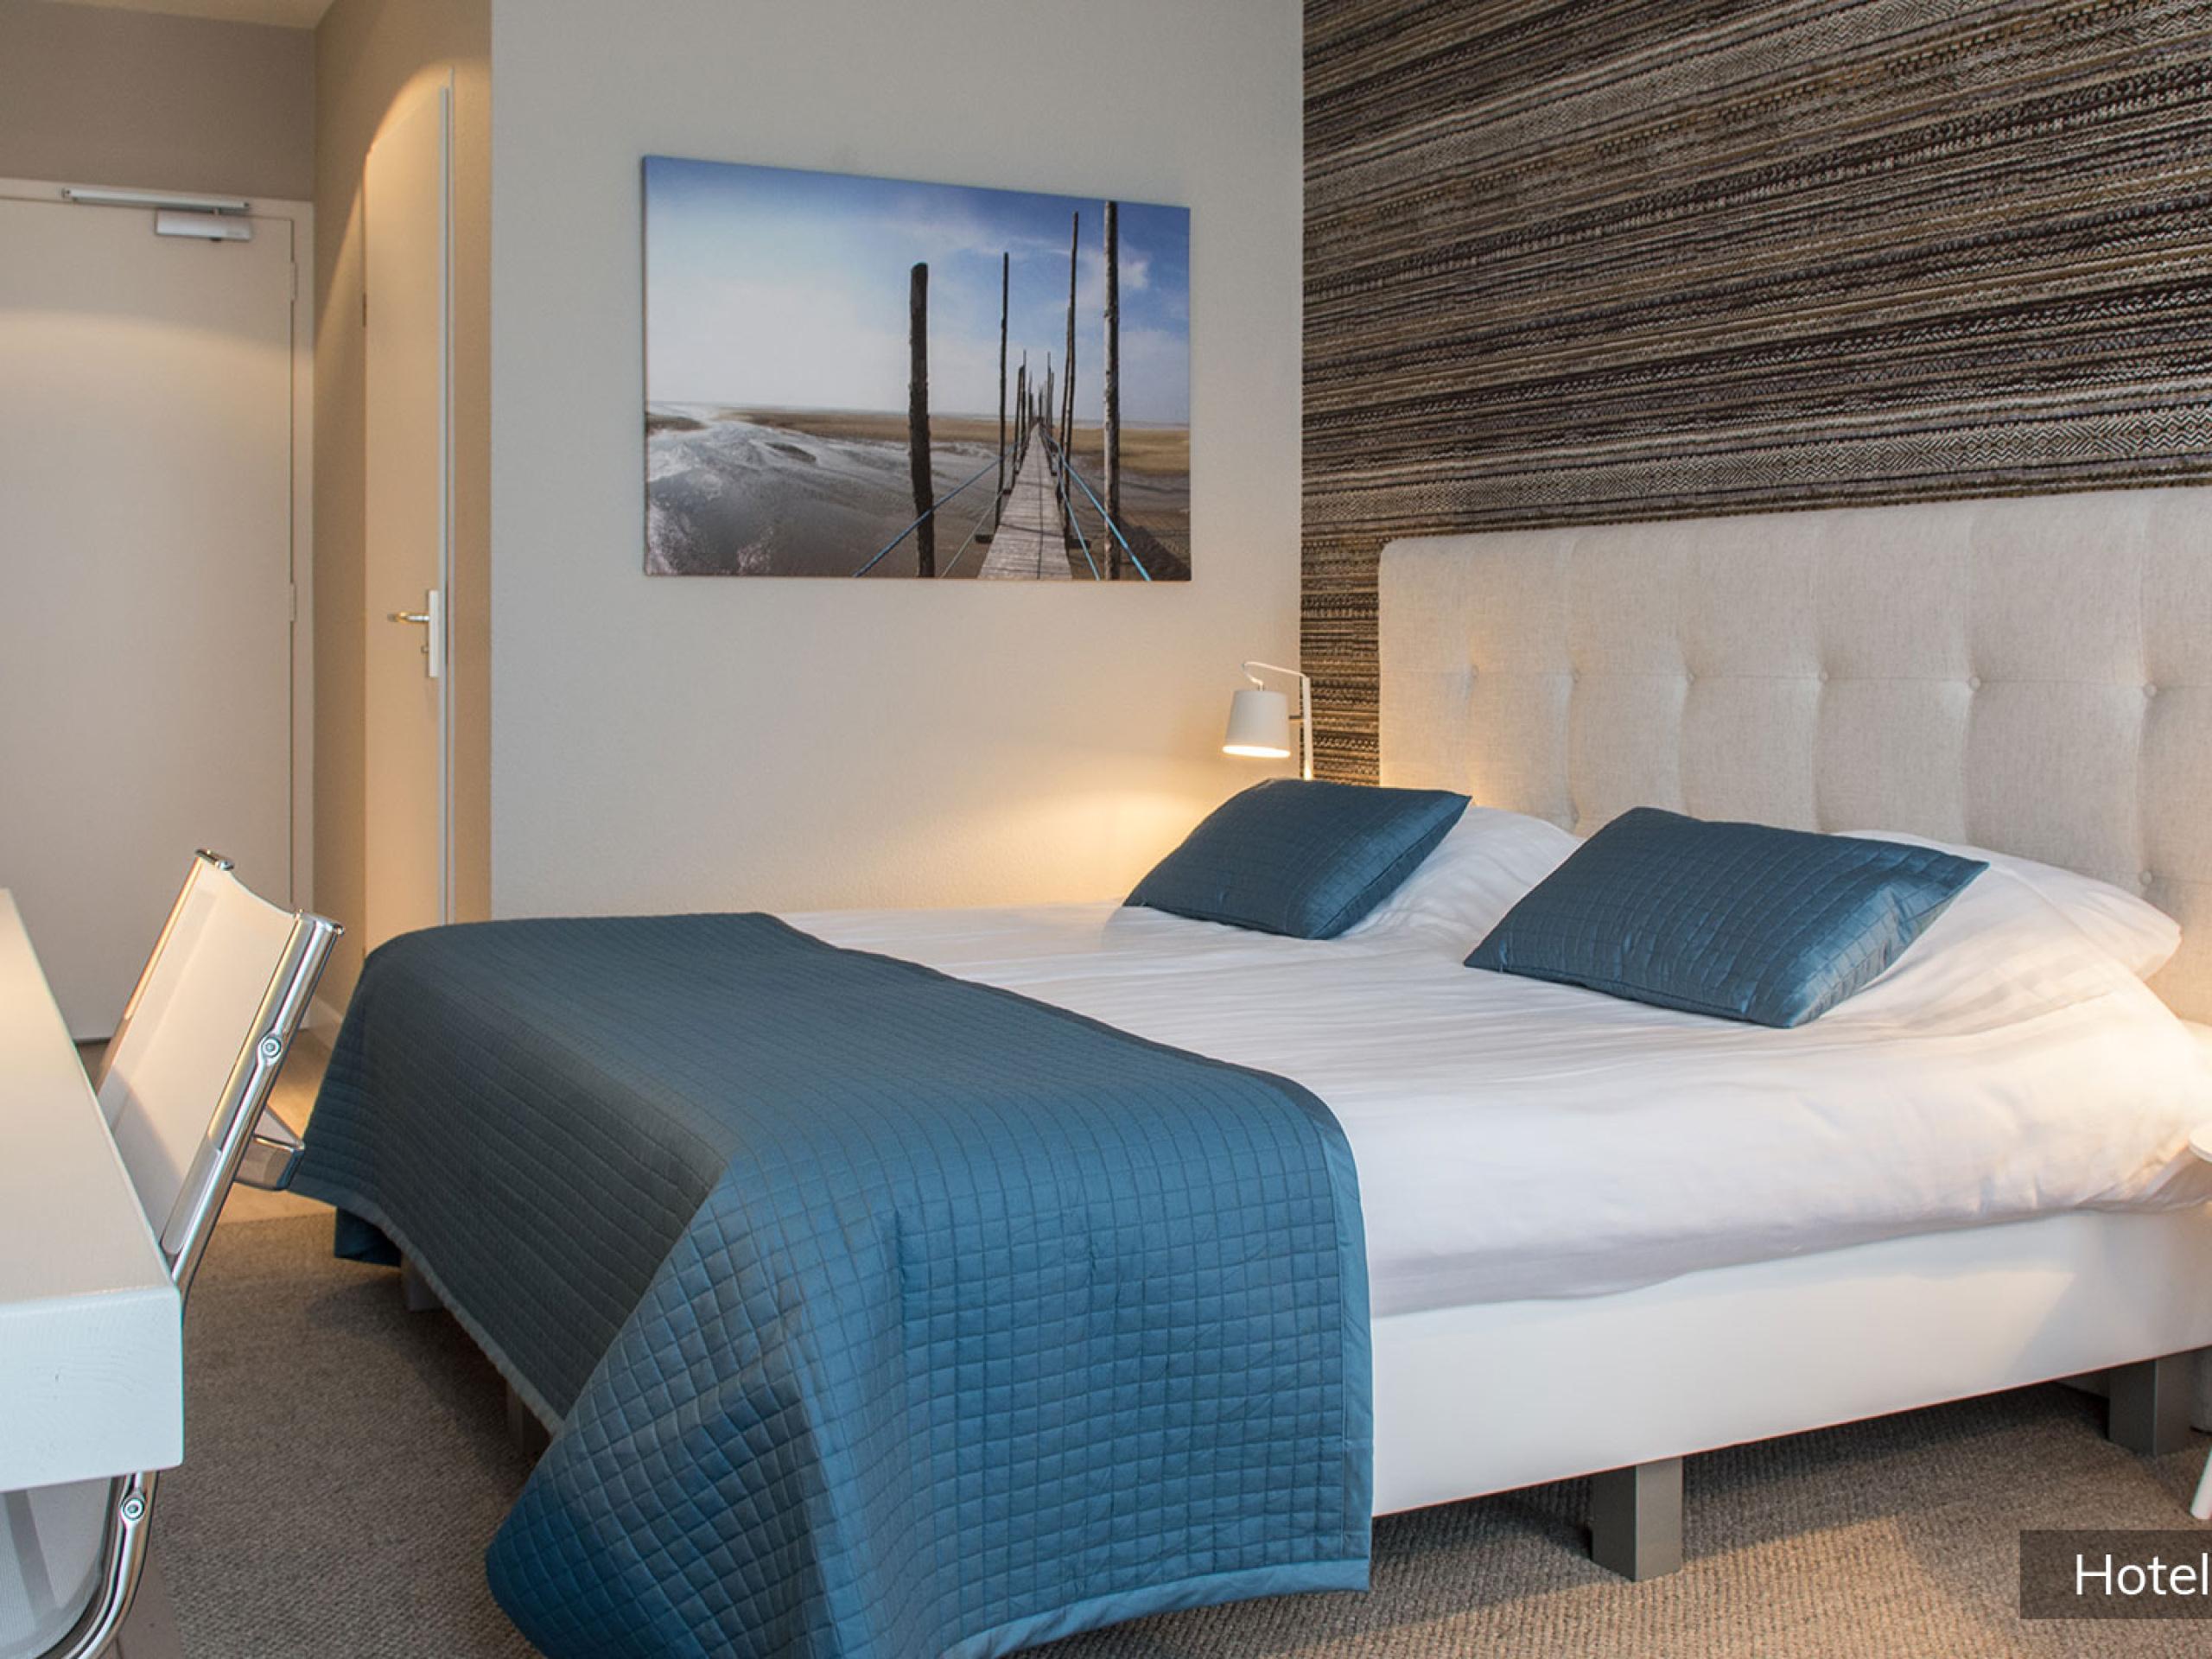 Großes stilvolles sehr komfortables Hotelzimmer bei De Cocksdorp